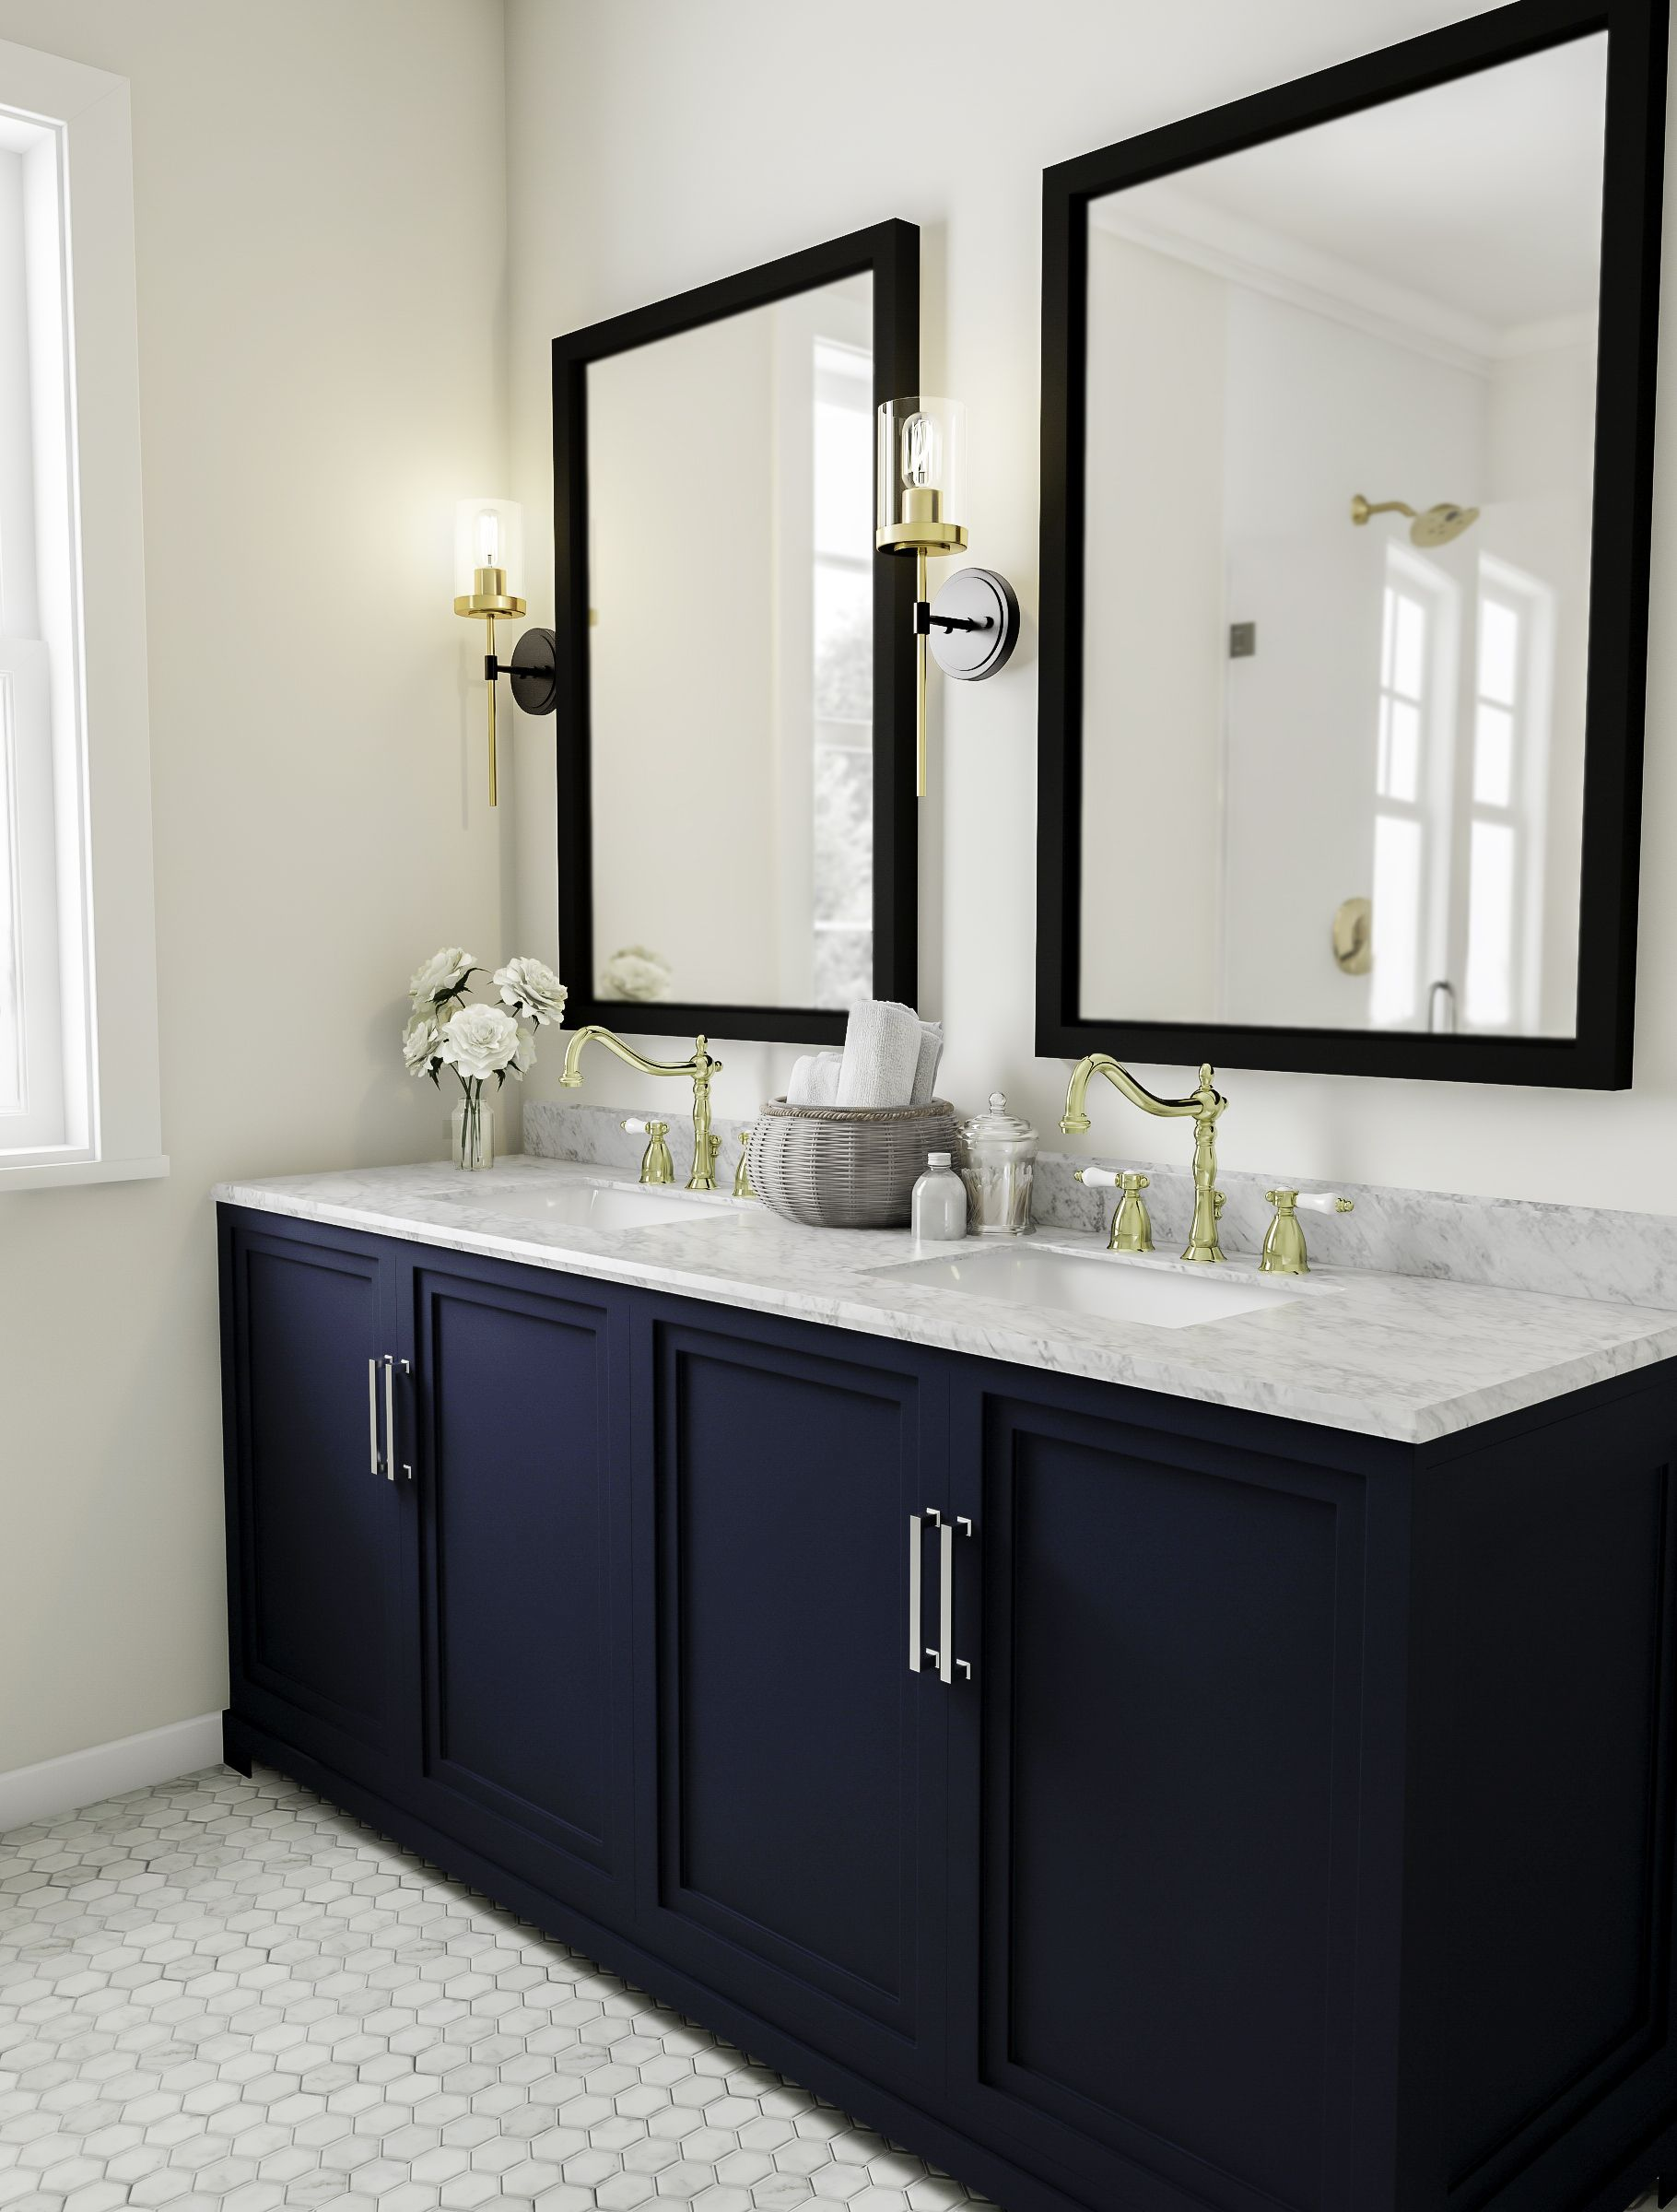 Traditional Bathroom With Dark Blue Vanity Bathroom Vanity Decor Bamboo Bathroom Traditional Bathroom [ 2400 x 1820 Pixel ]